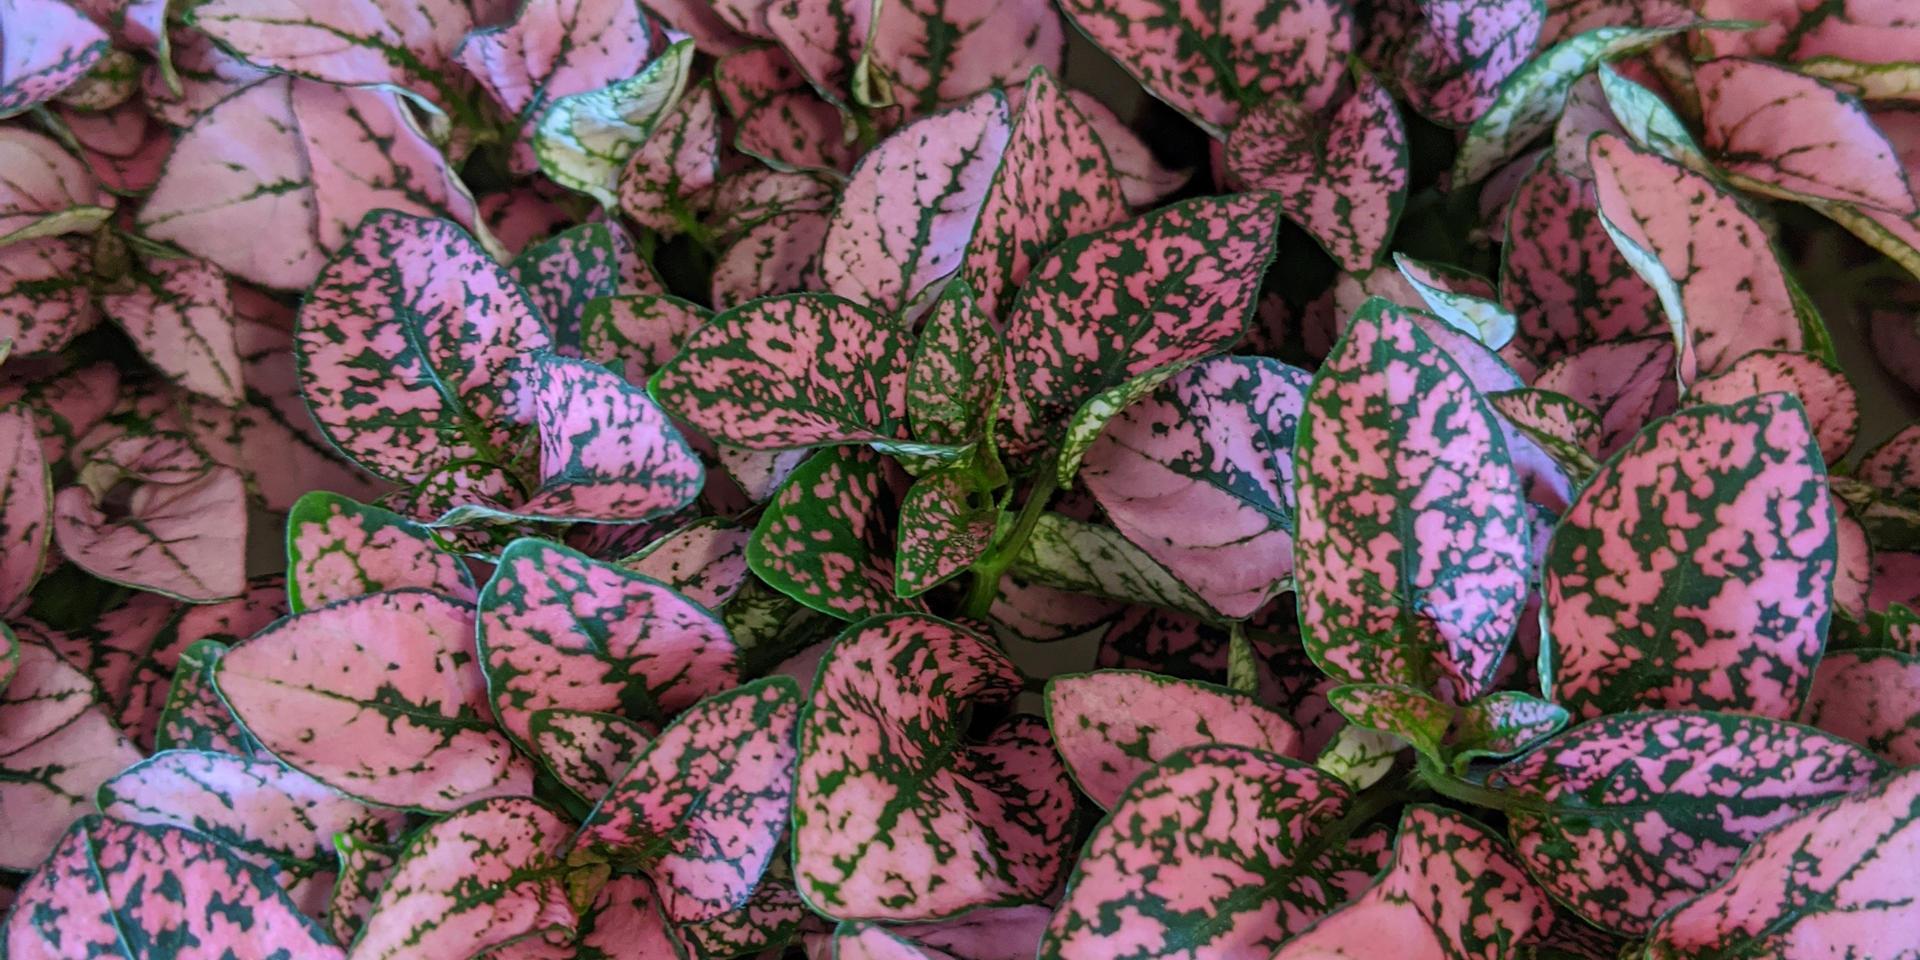 Hippo/Polka Dot Plant